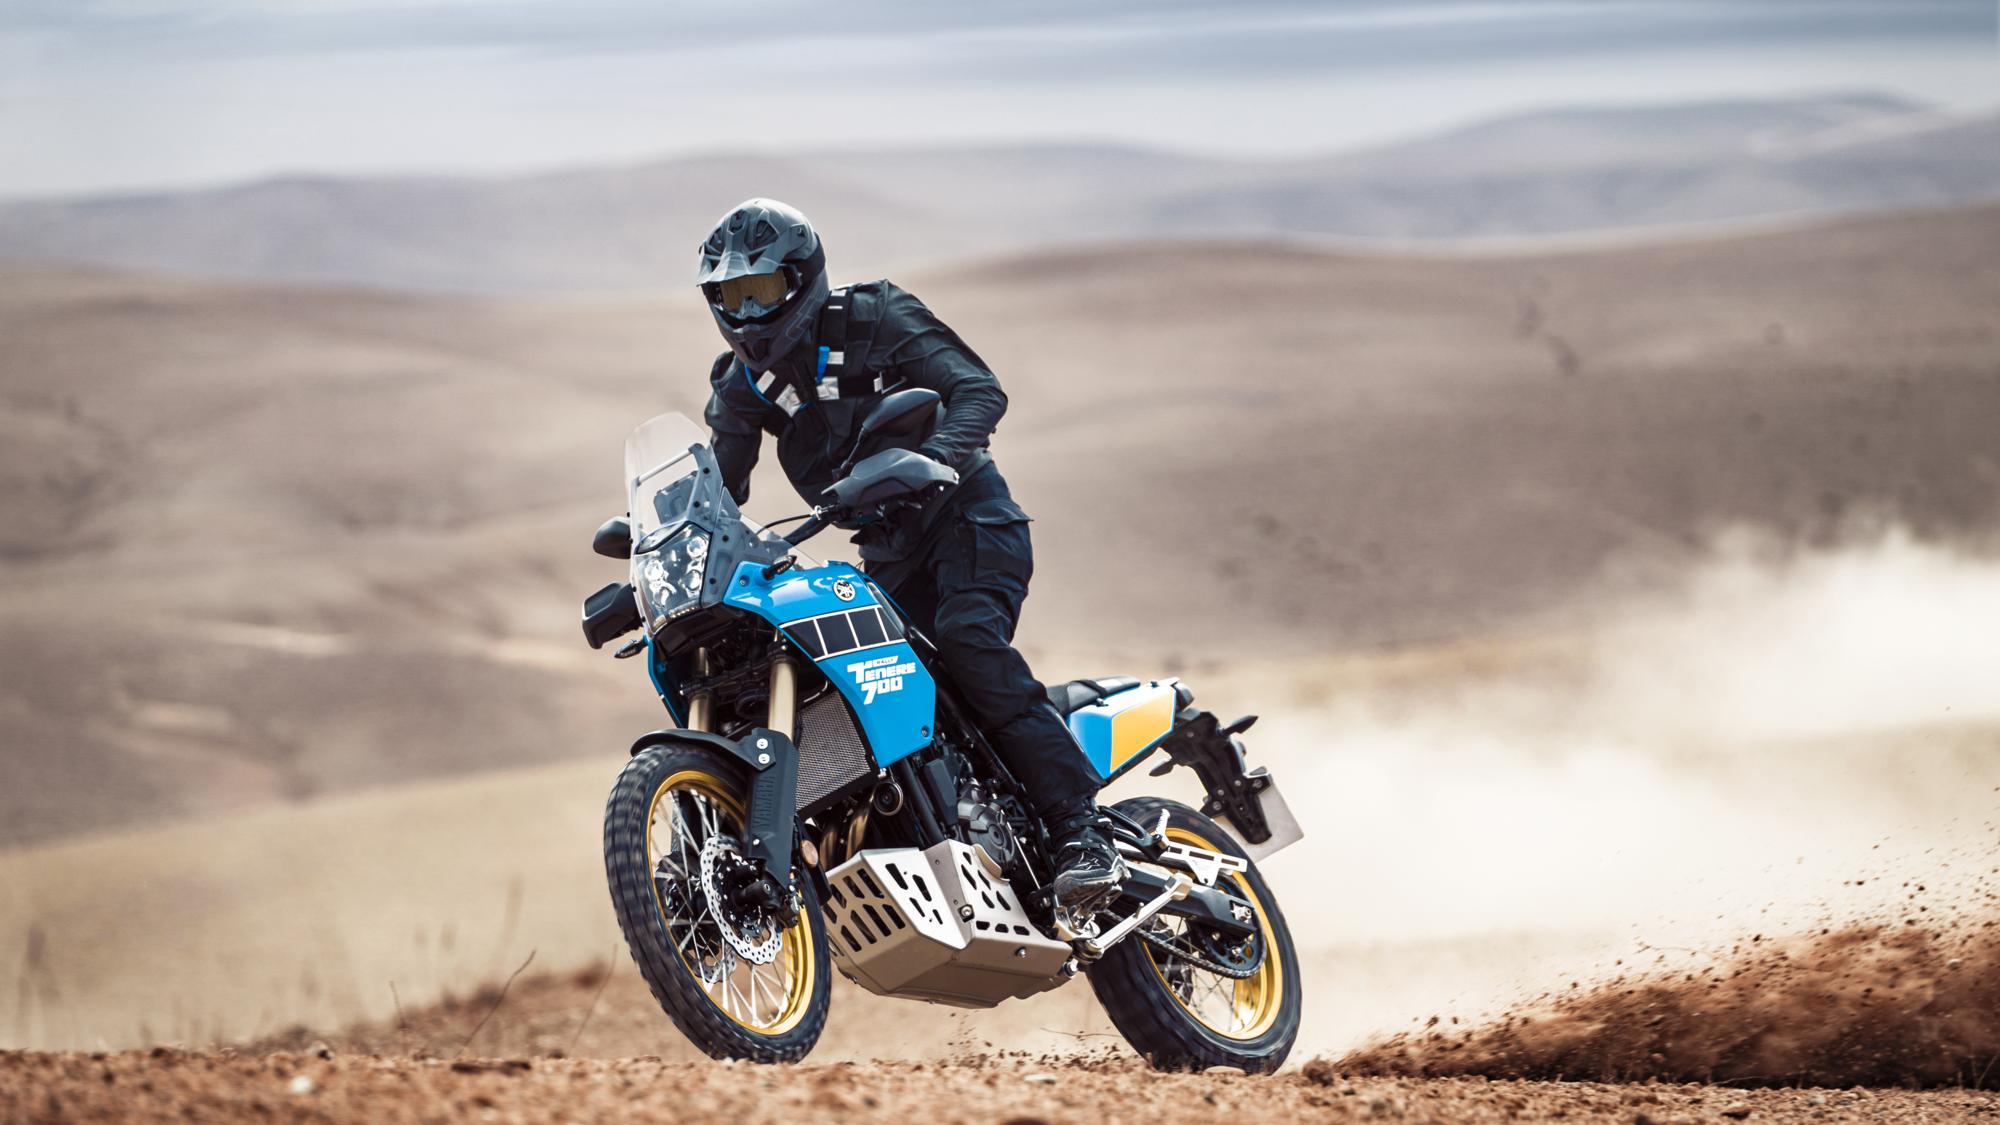 Yamaha tenere masuk Indonesia